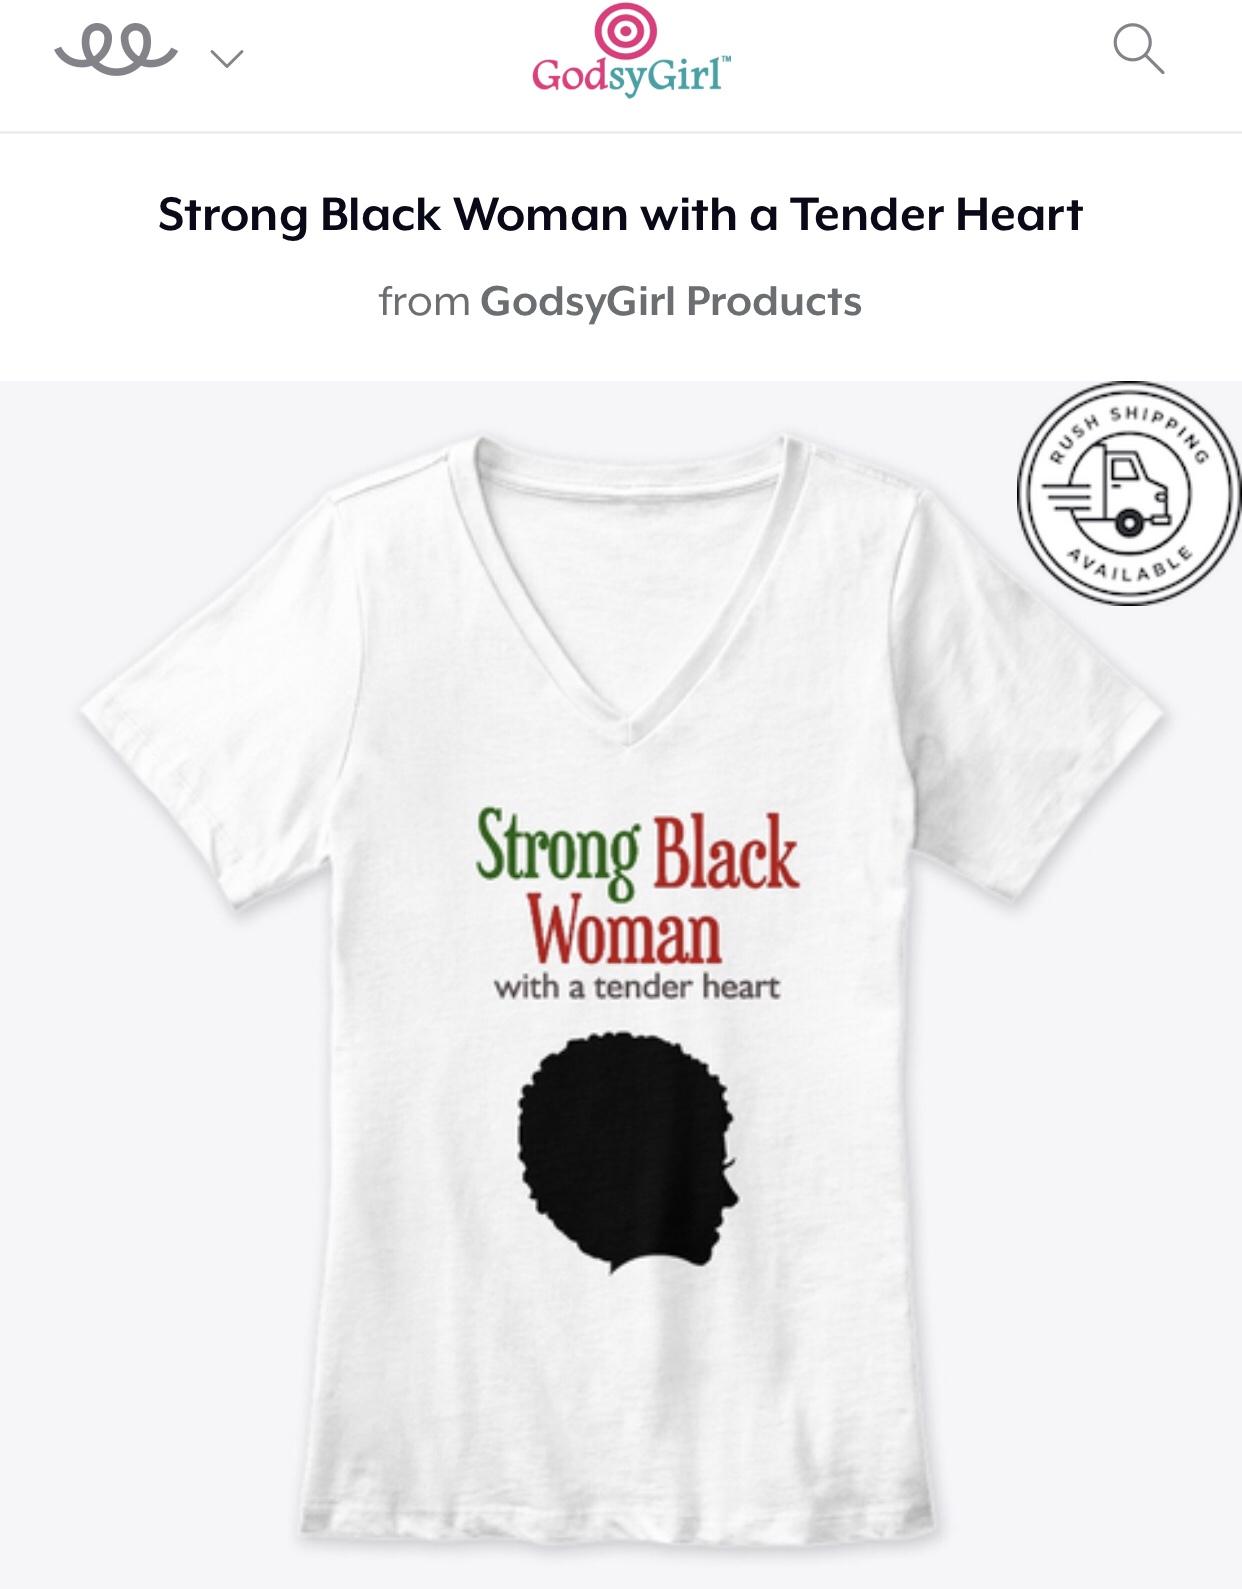 Strong Black Christian Woman